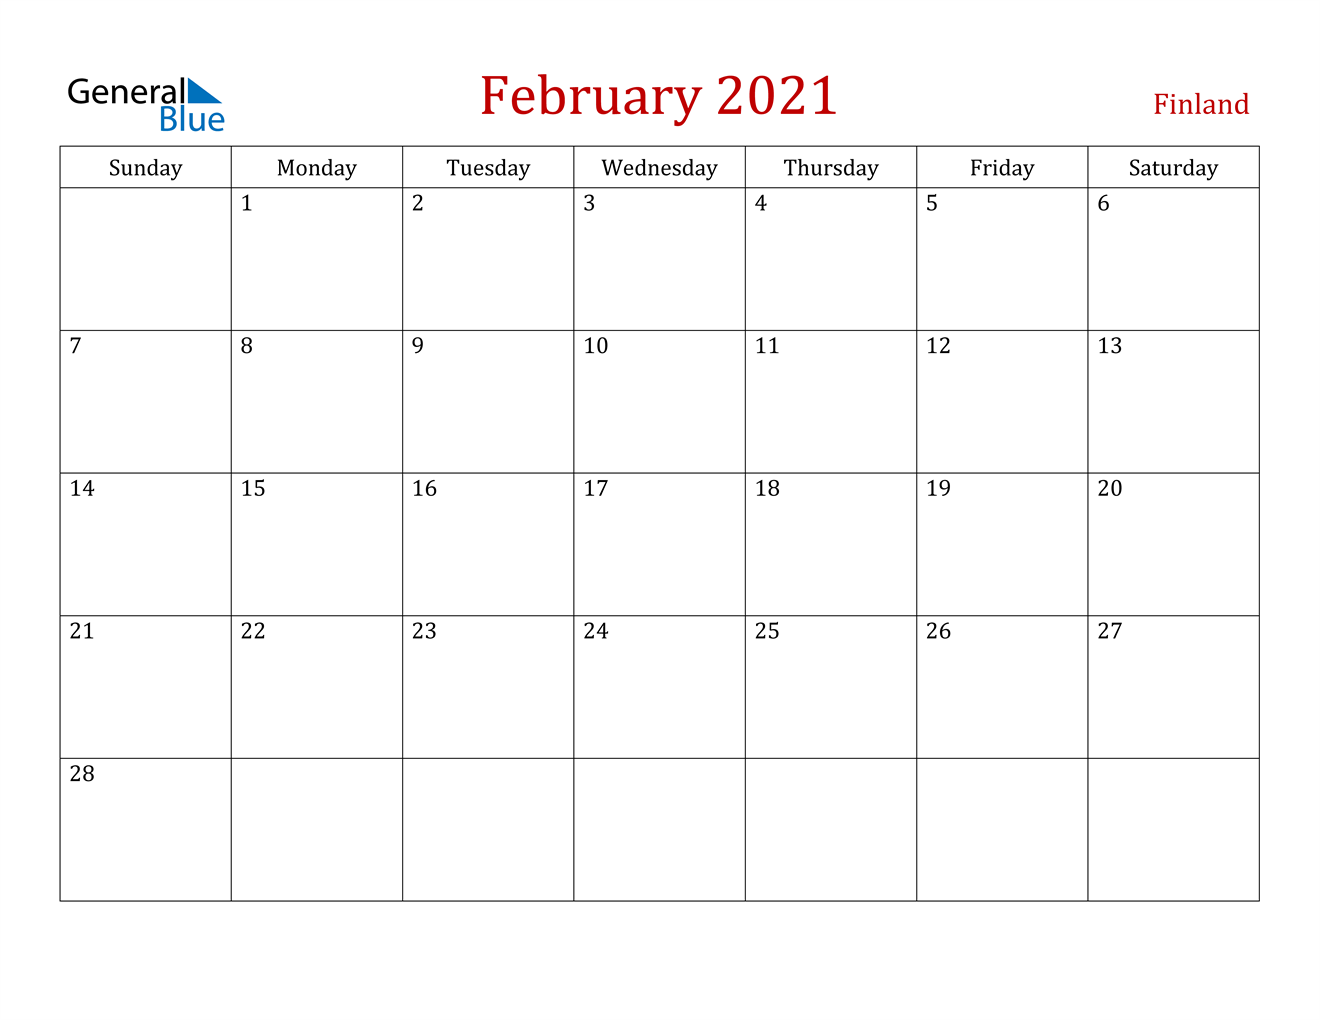 February 2021 Calendar - Finland